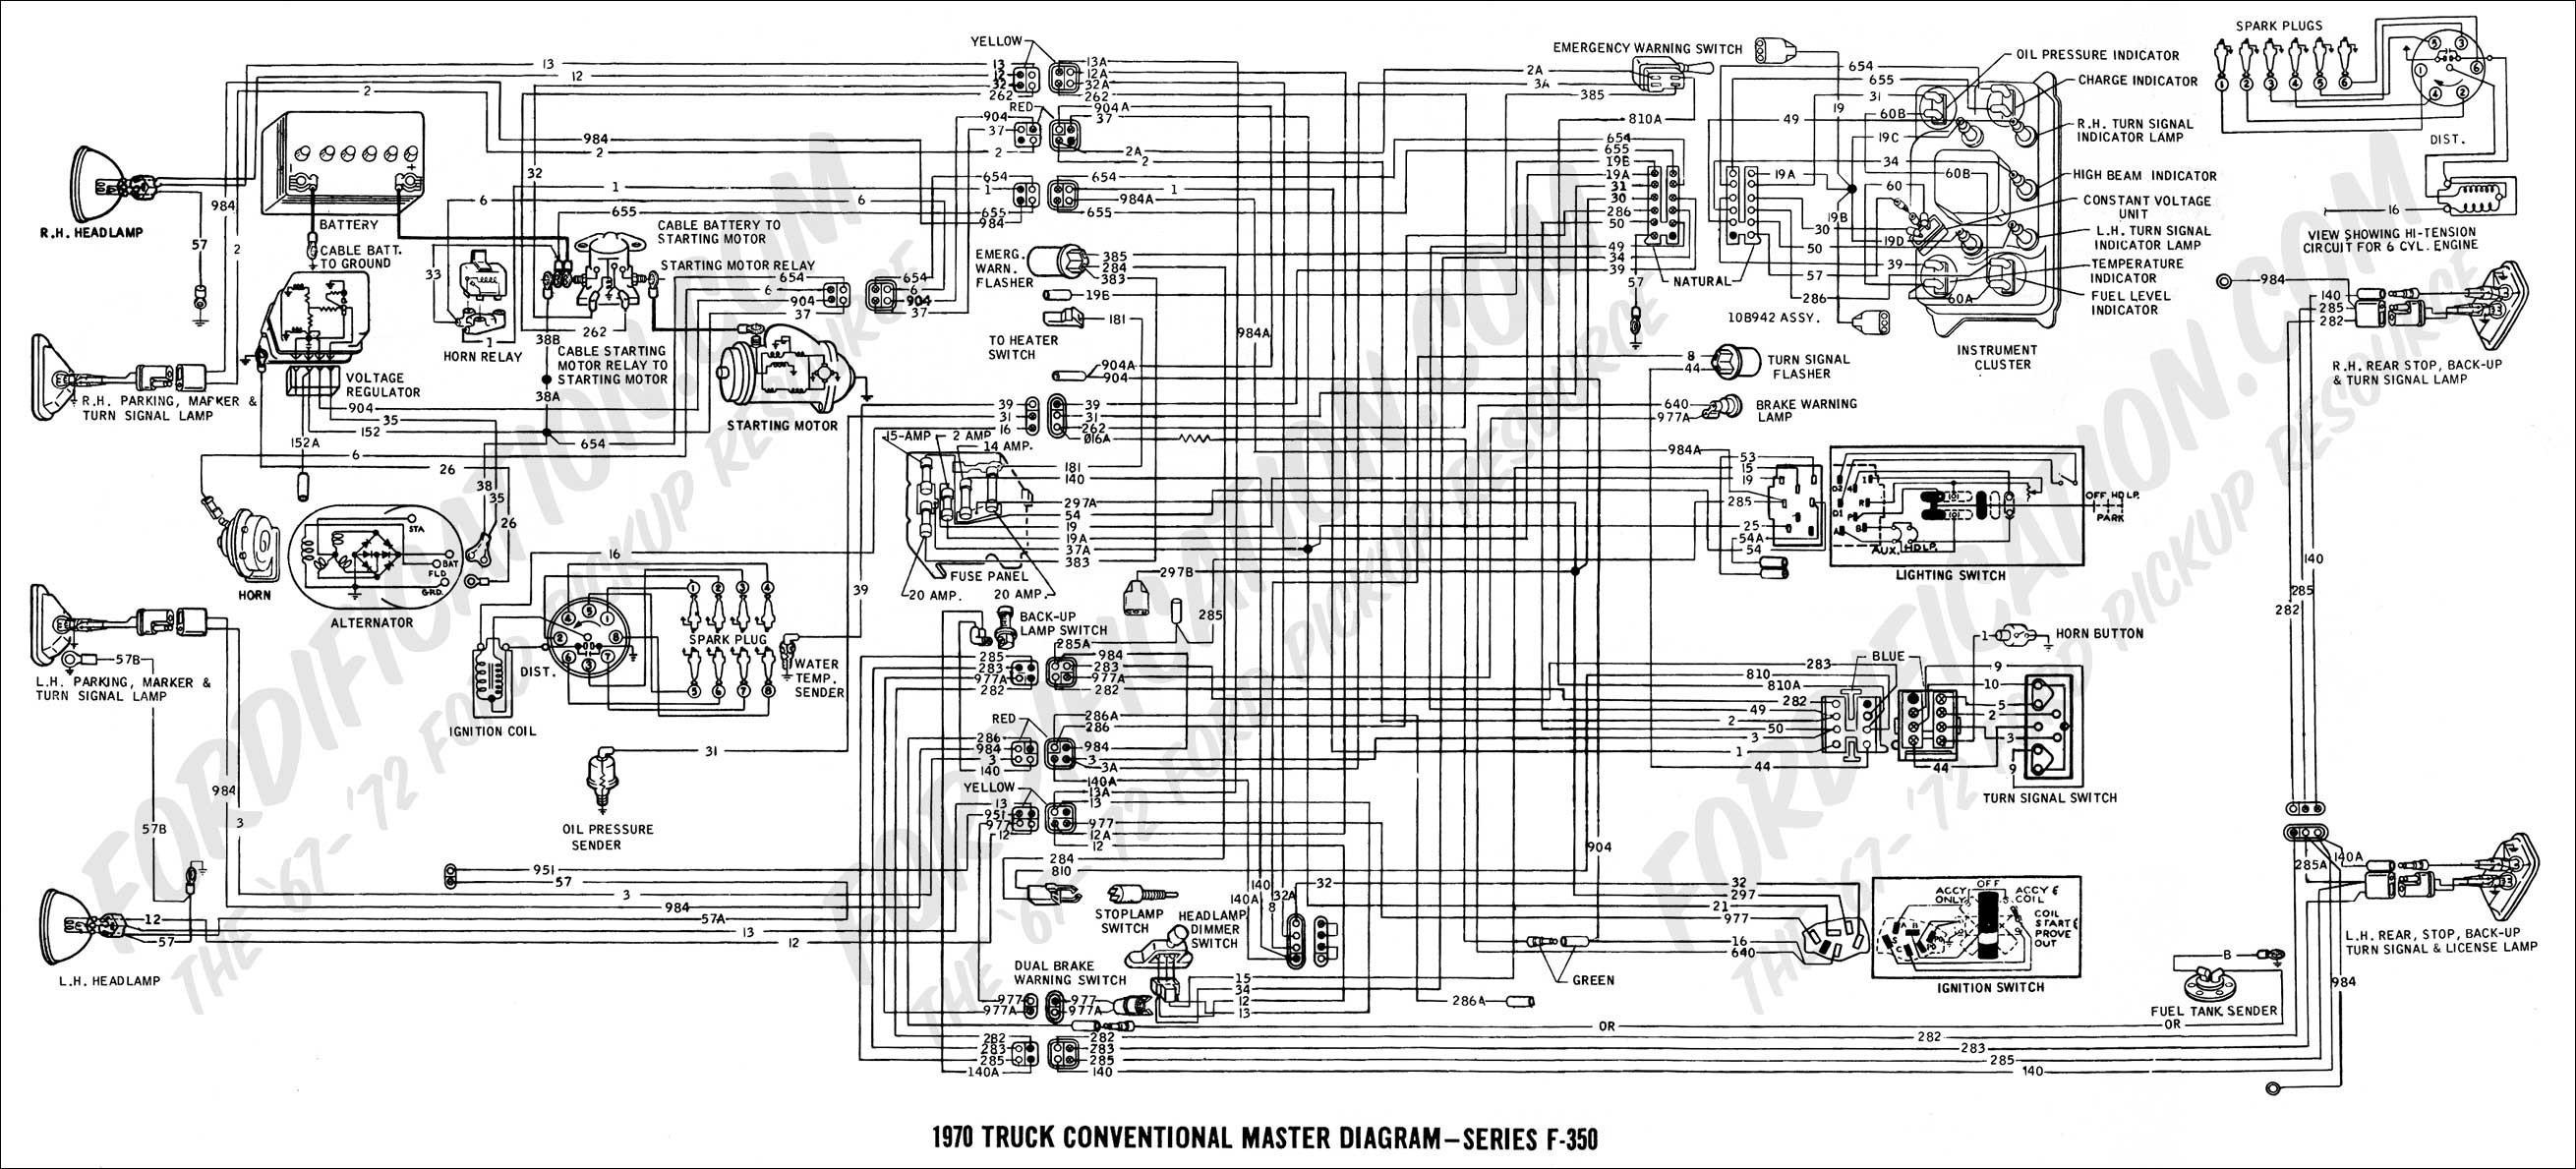 1996 windstar fuse box 1996 ford windstar engine diagram wiring diagrams  1996 ford windstar engine diagram